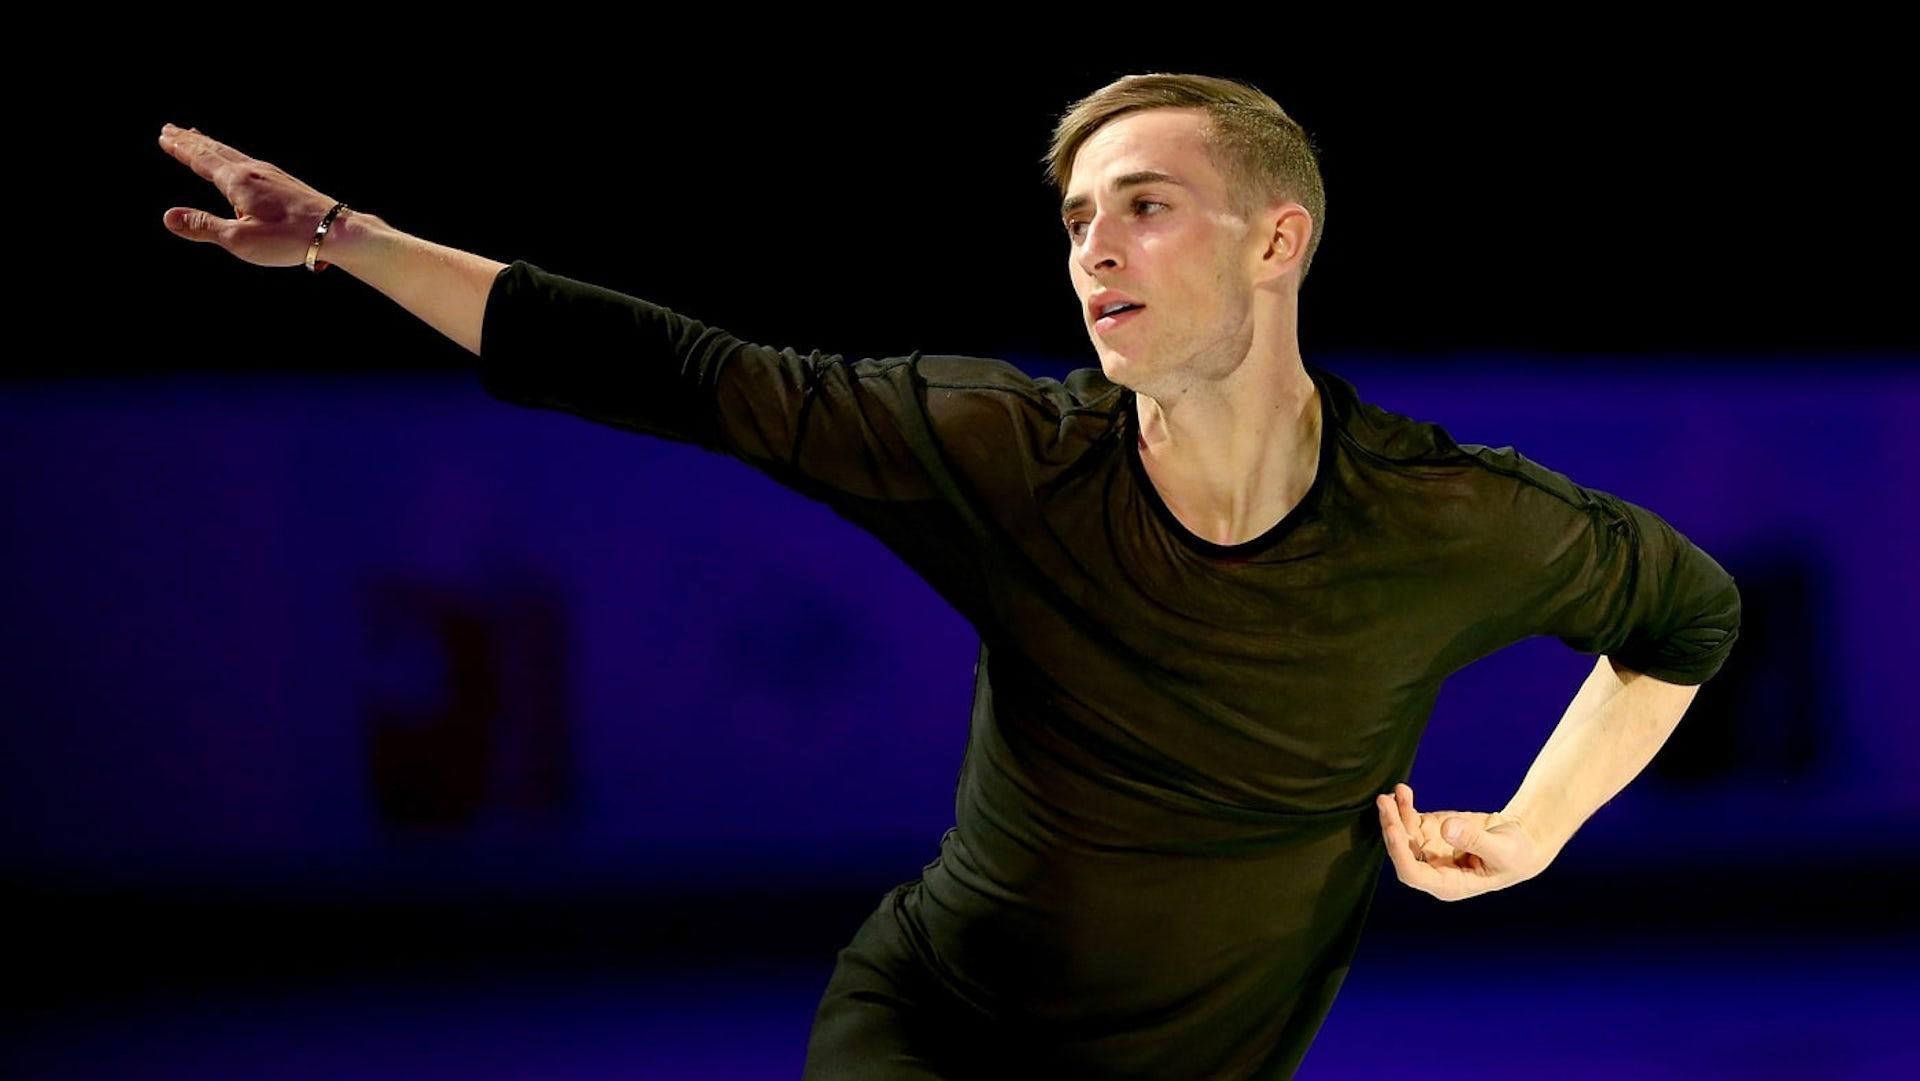 Why sport hasn't made much progress on LGBTI+ rights since the Sochi Olympics file 20180202 162077 vz5xgp